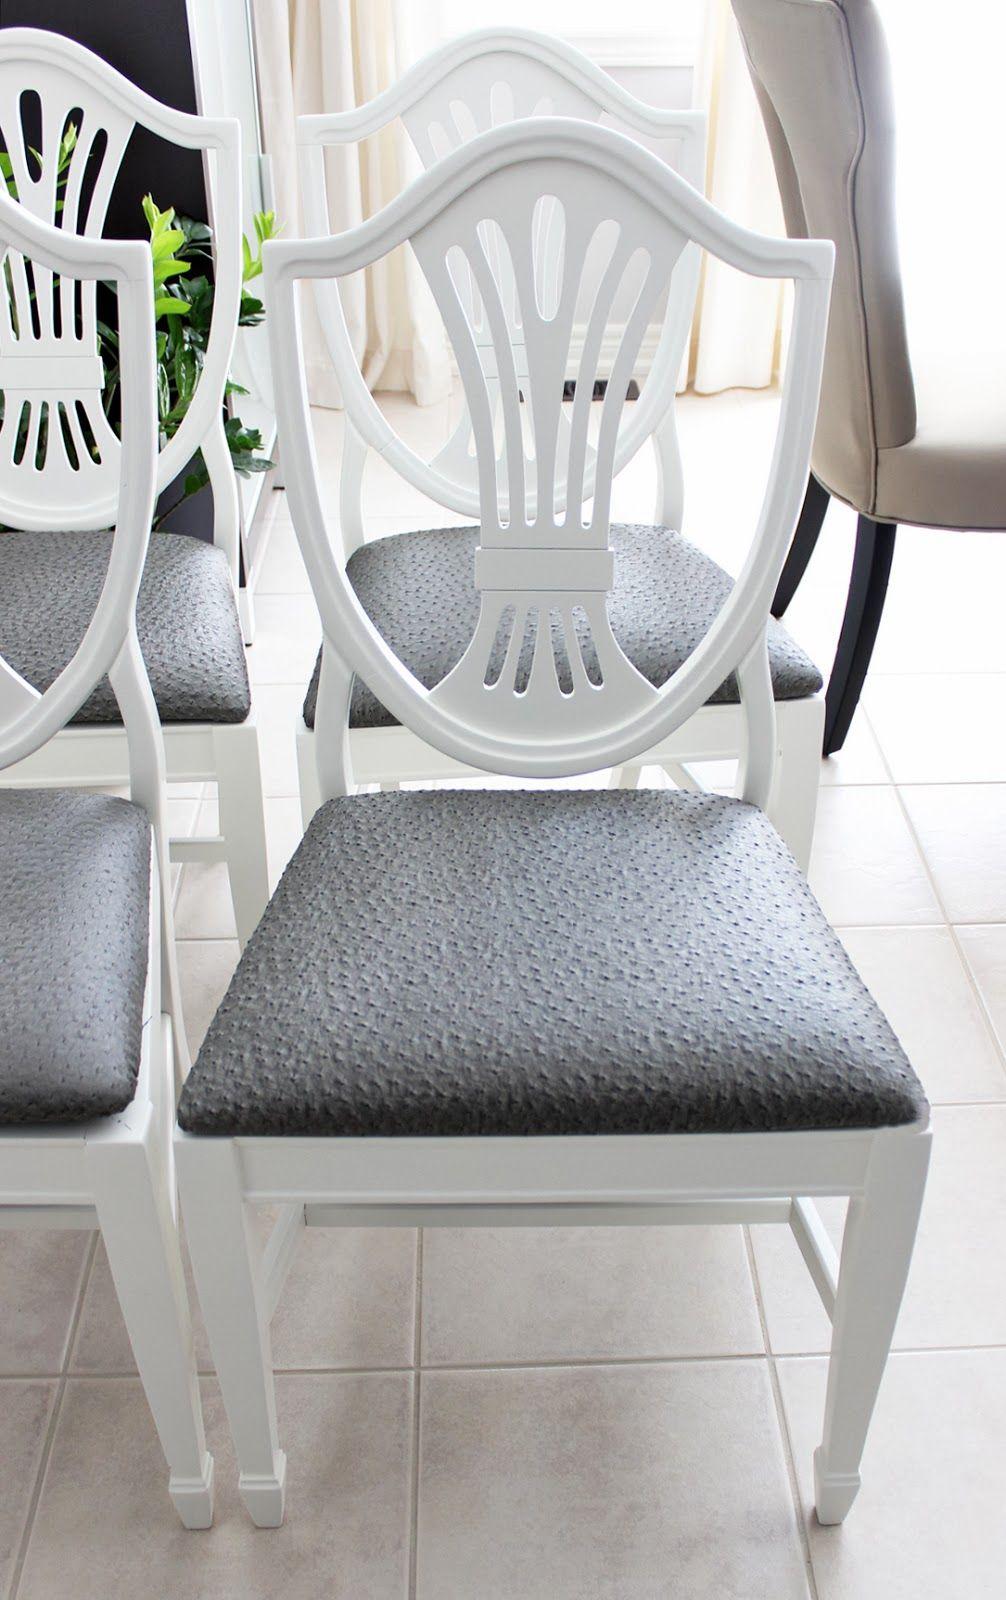 AM Dolce Vita: Antique Shield Back Chair Transformation More - AM Dolce Vita: Antique Shield Back Chair Transformation